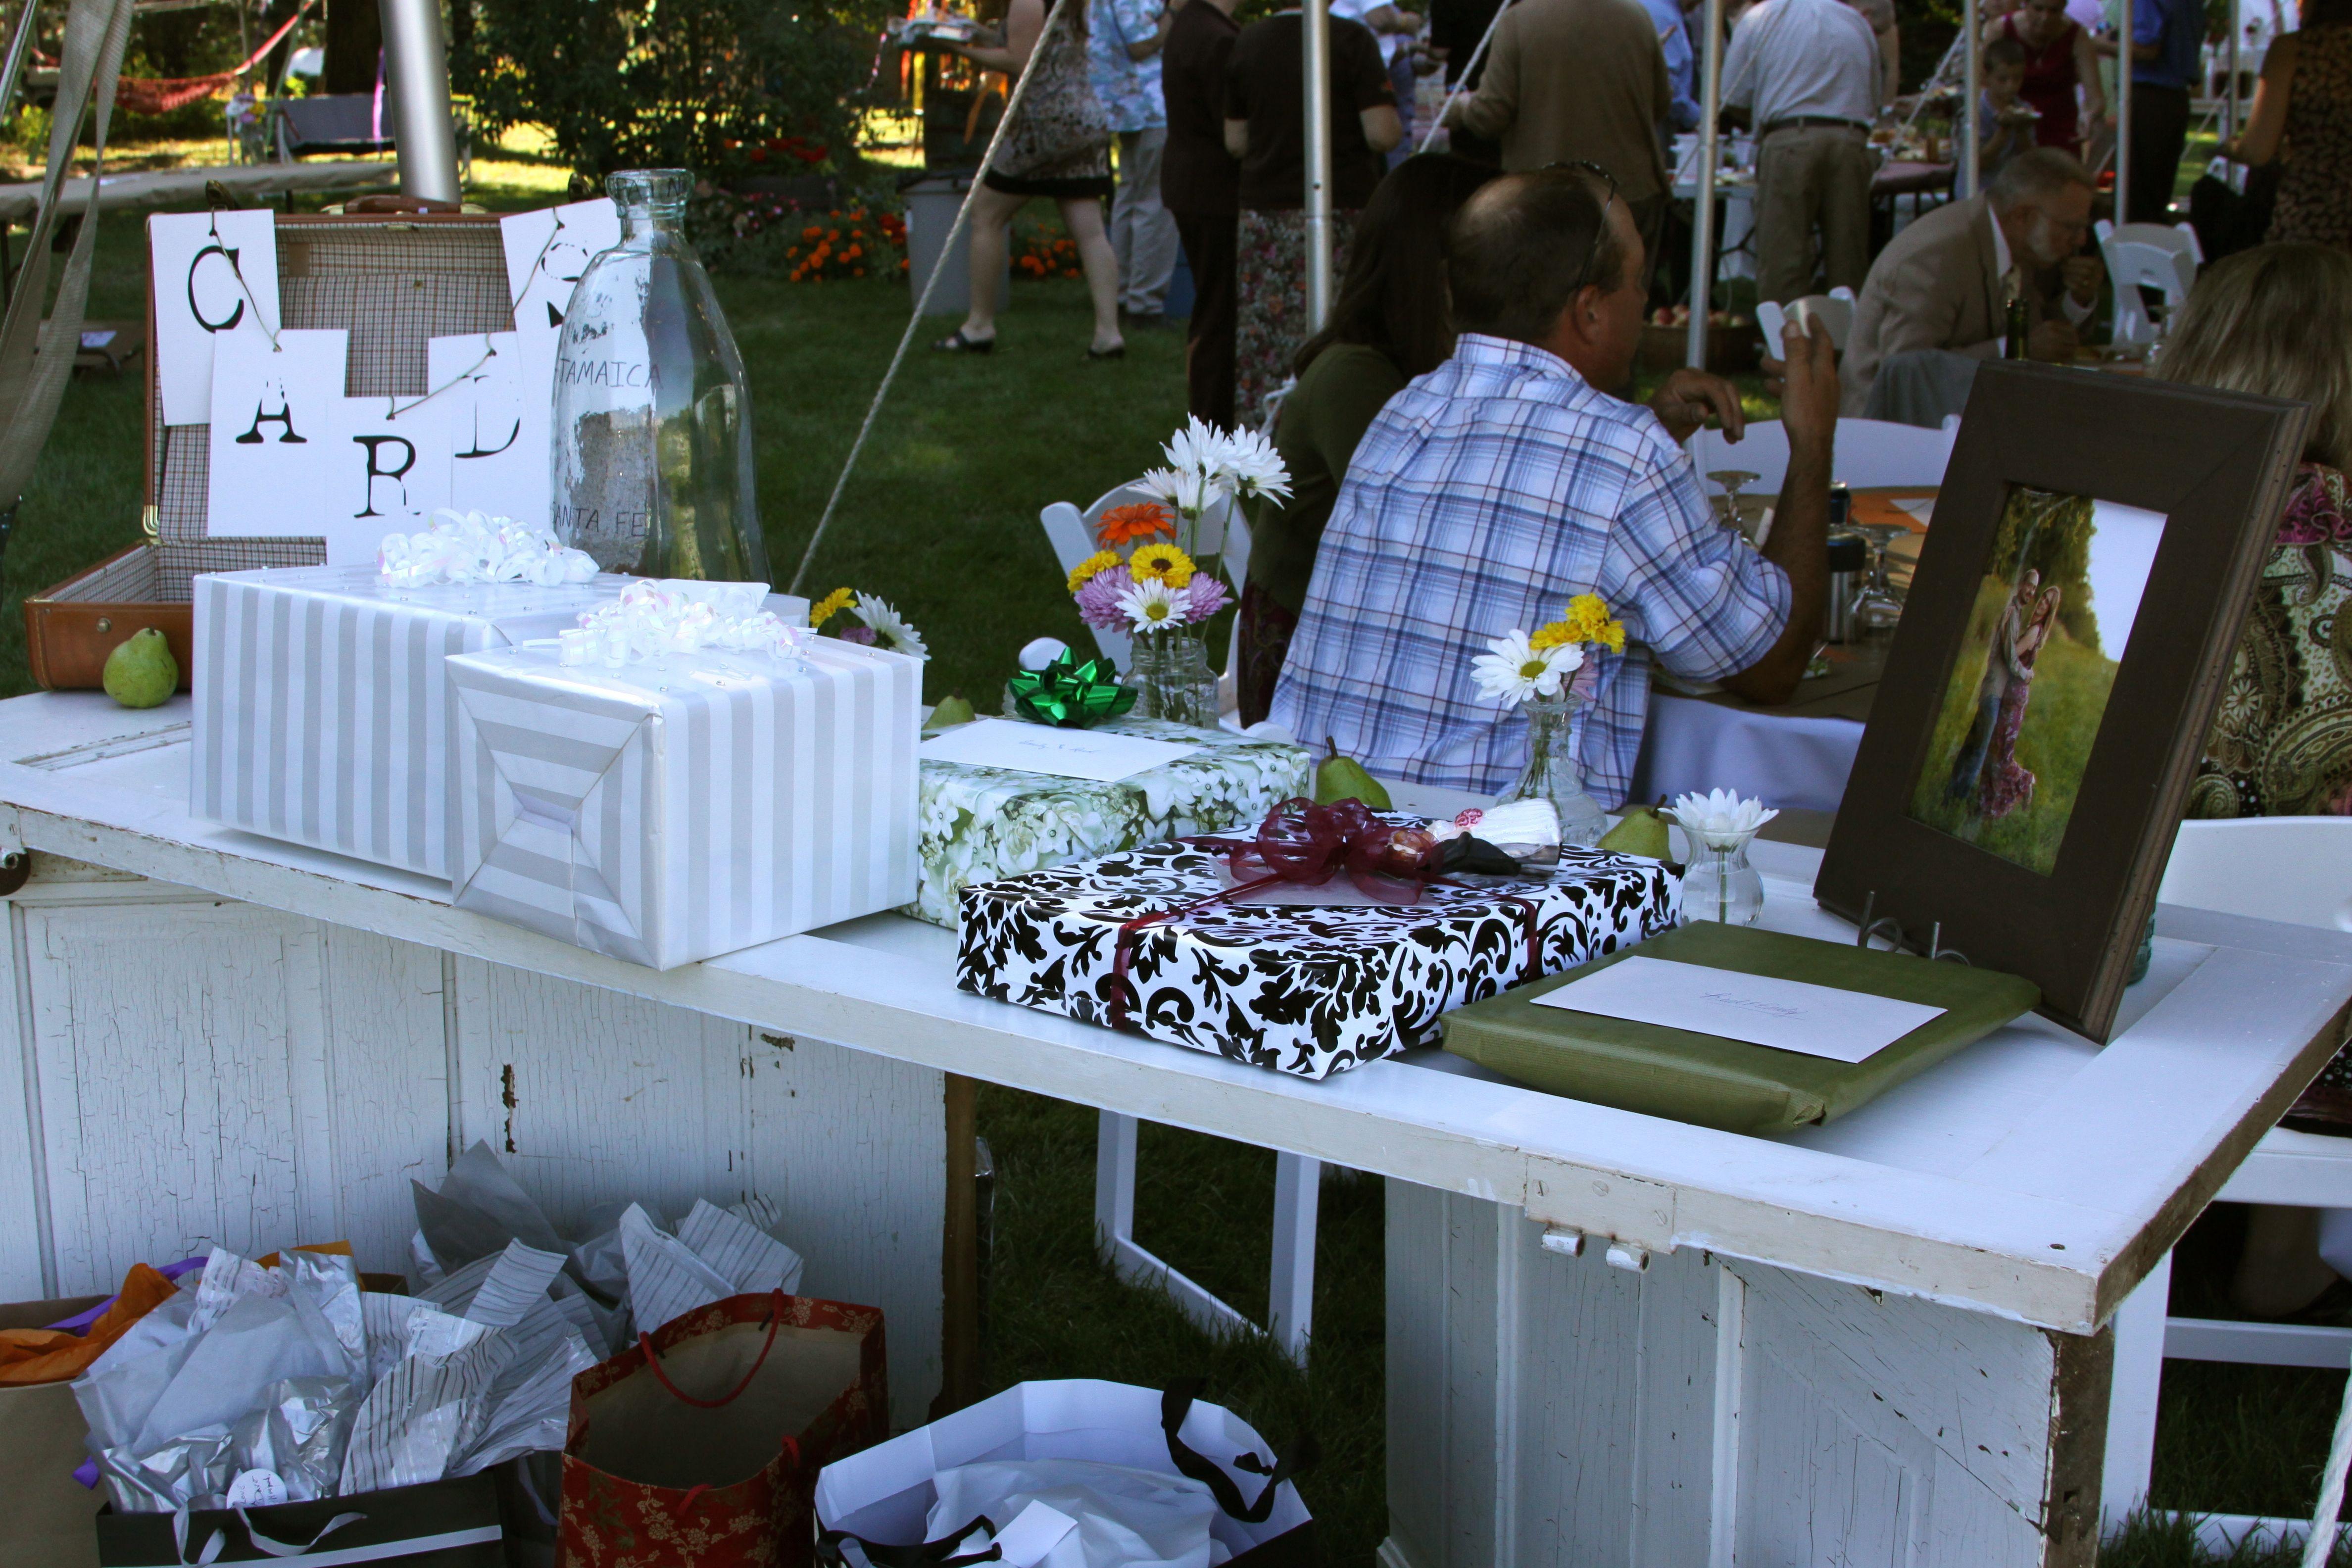 Wedding Present Table Pinterest : gift table Wedding Reality 9.10.11 Pinterest